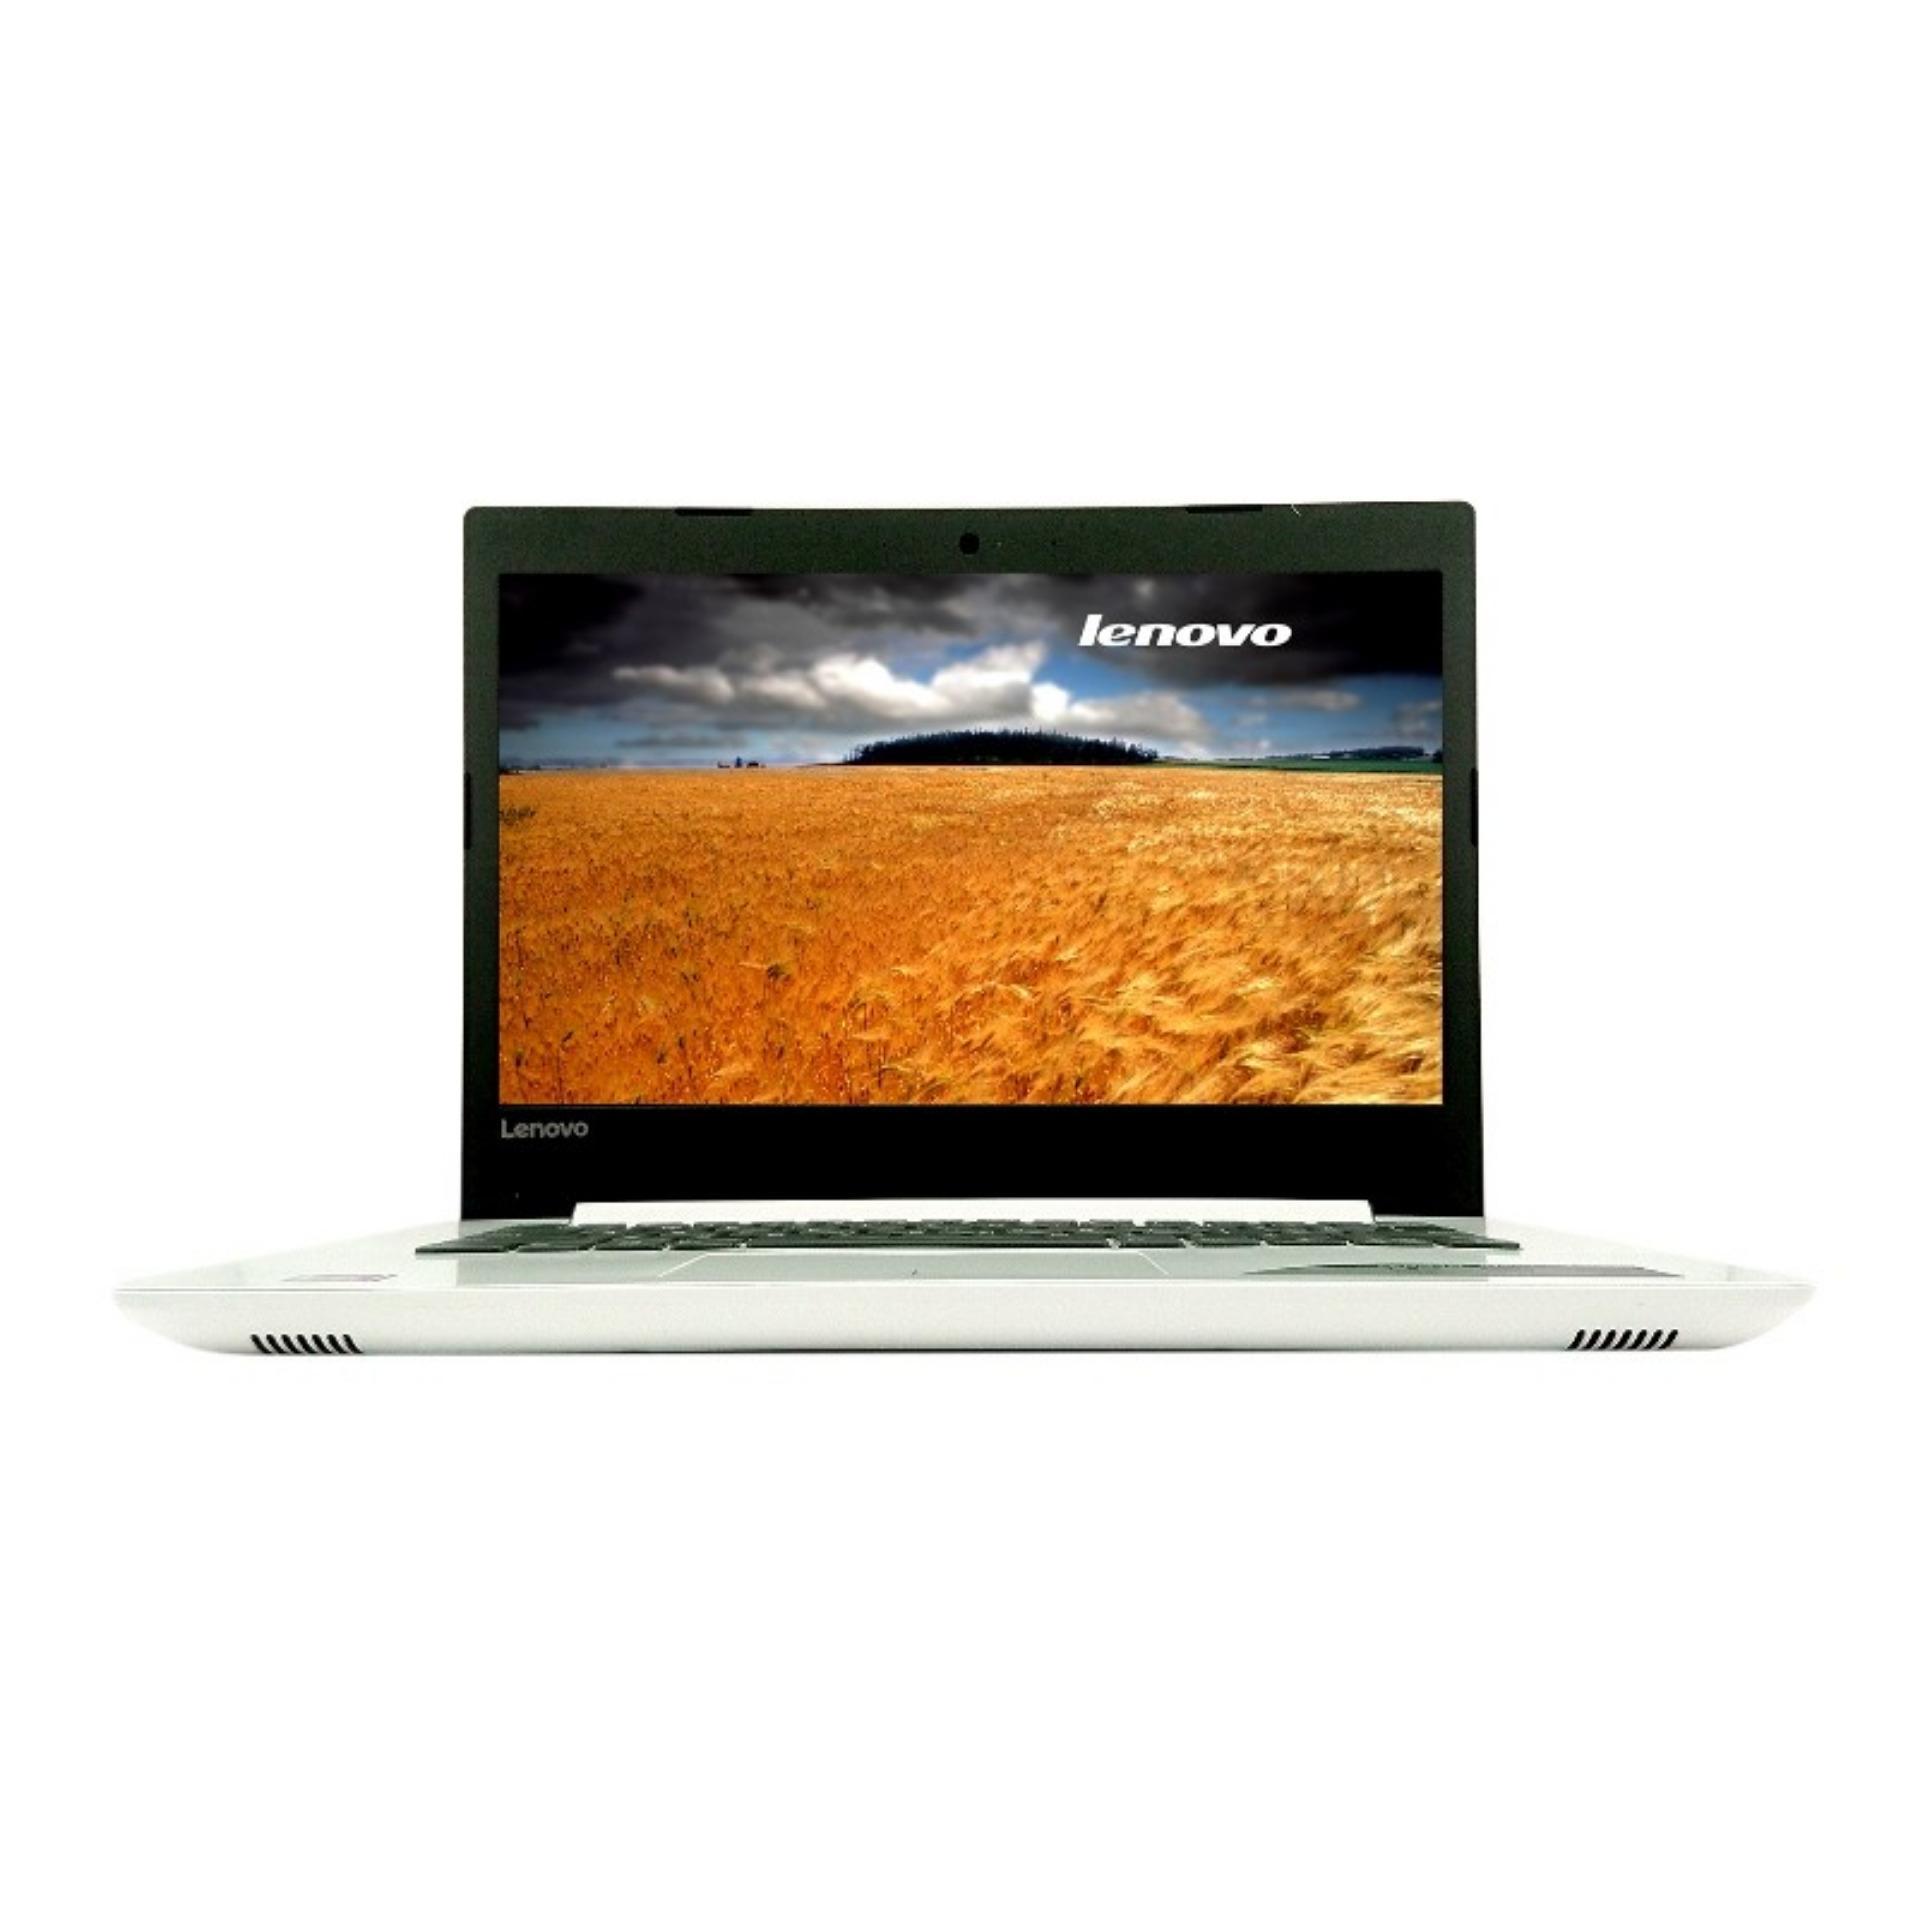 PROMO LENOVO IDEAPAD 320 2QID RID SID TID RAM 4 GB DDR4 HARDISK 500GB LAYAR